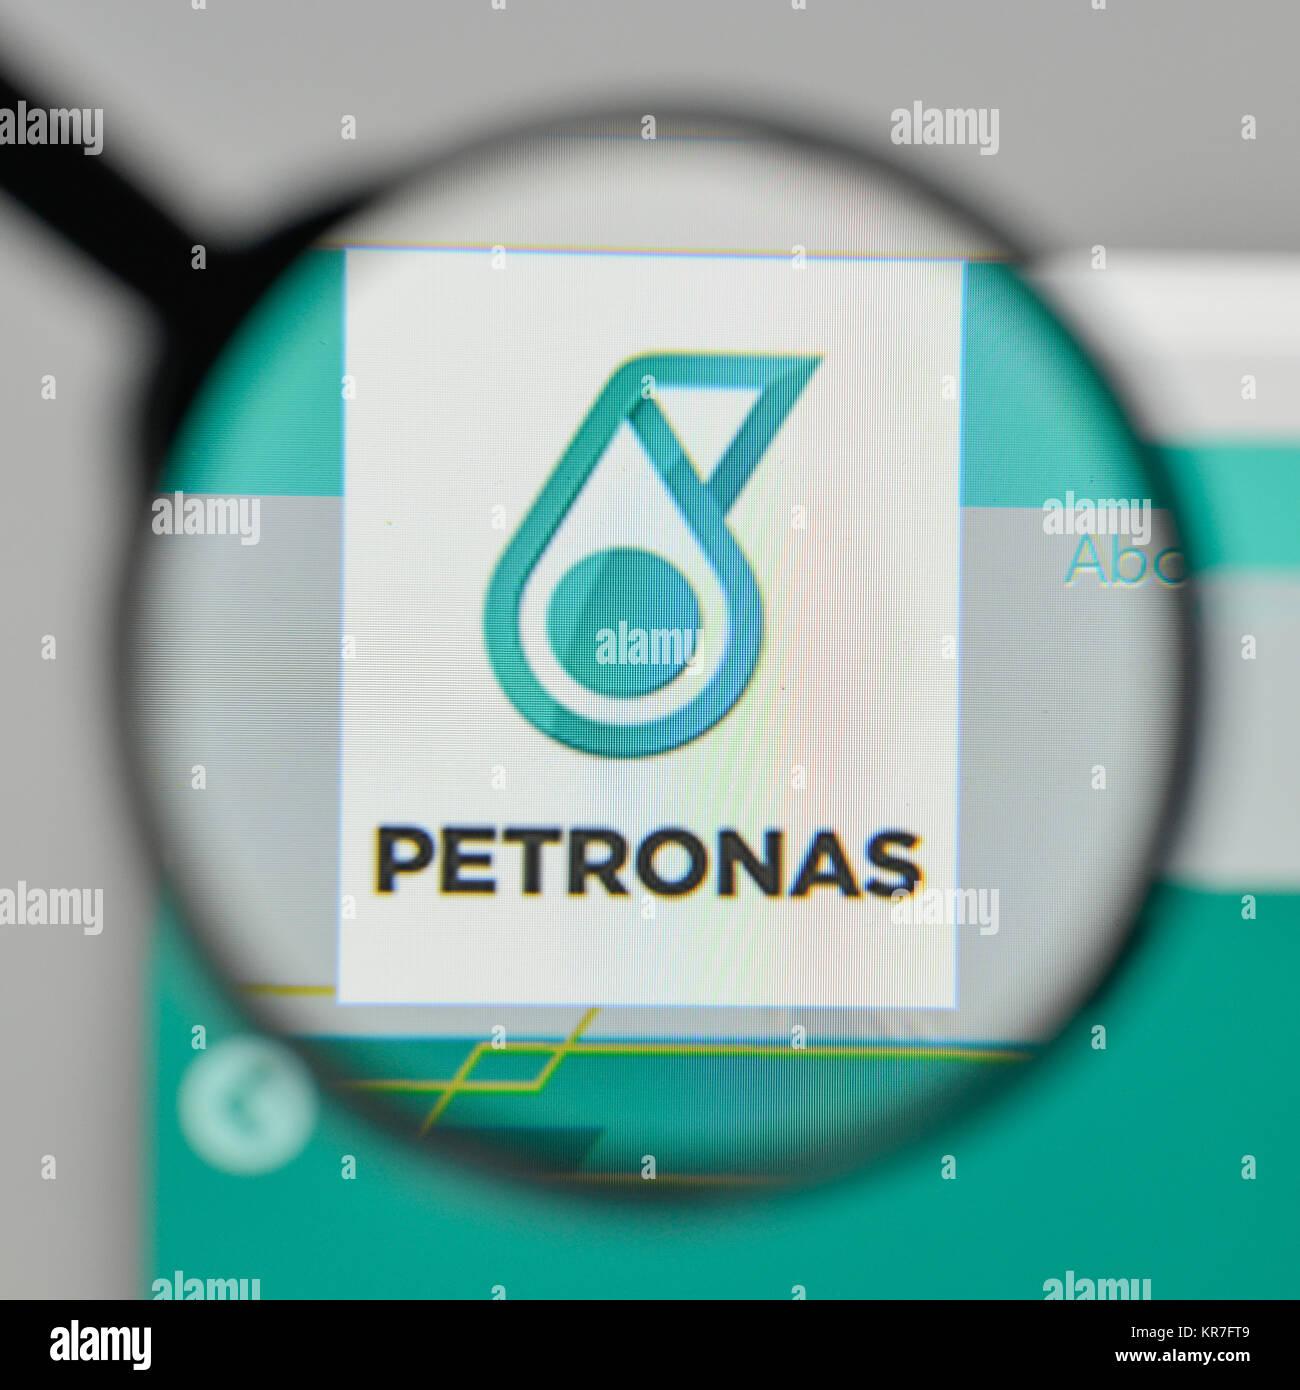 Milan italy november 1 2017 petronas logo on the website stock milan italy november 1 2017 petronas logo on the website homepage buycottarizona Gallery